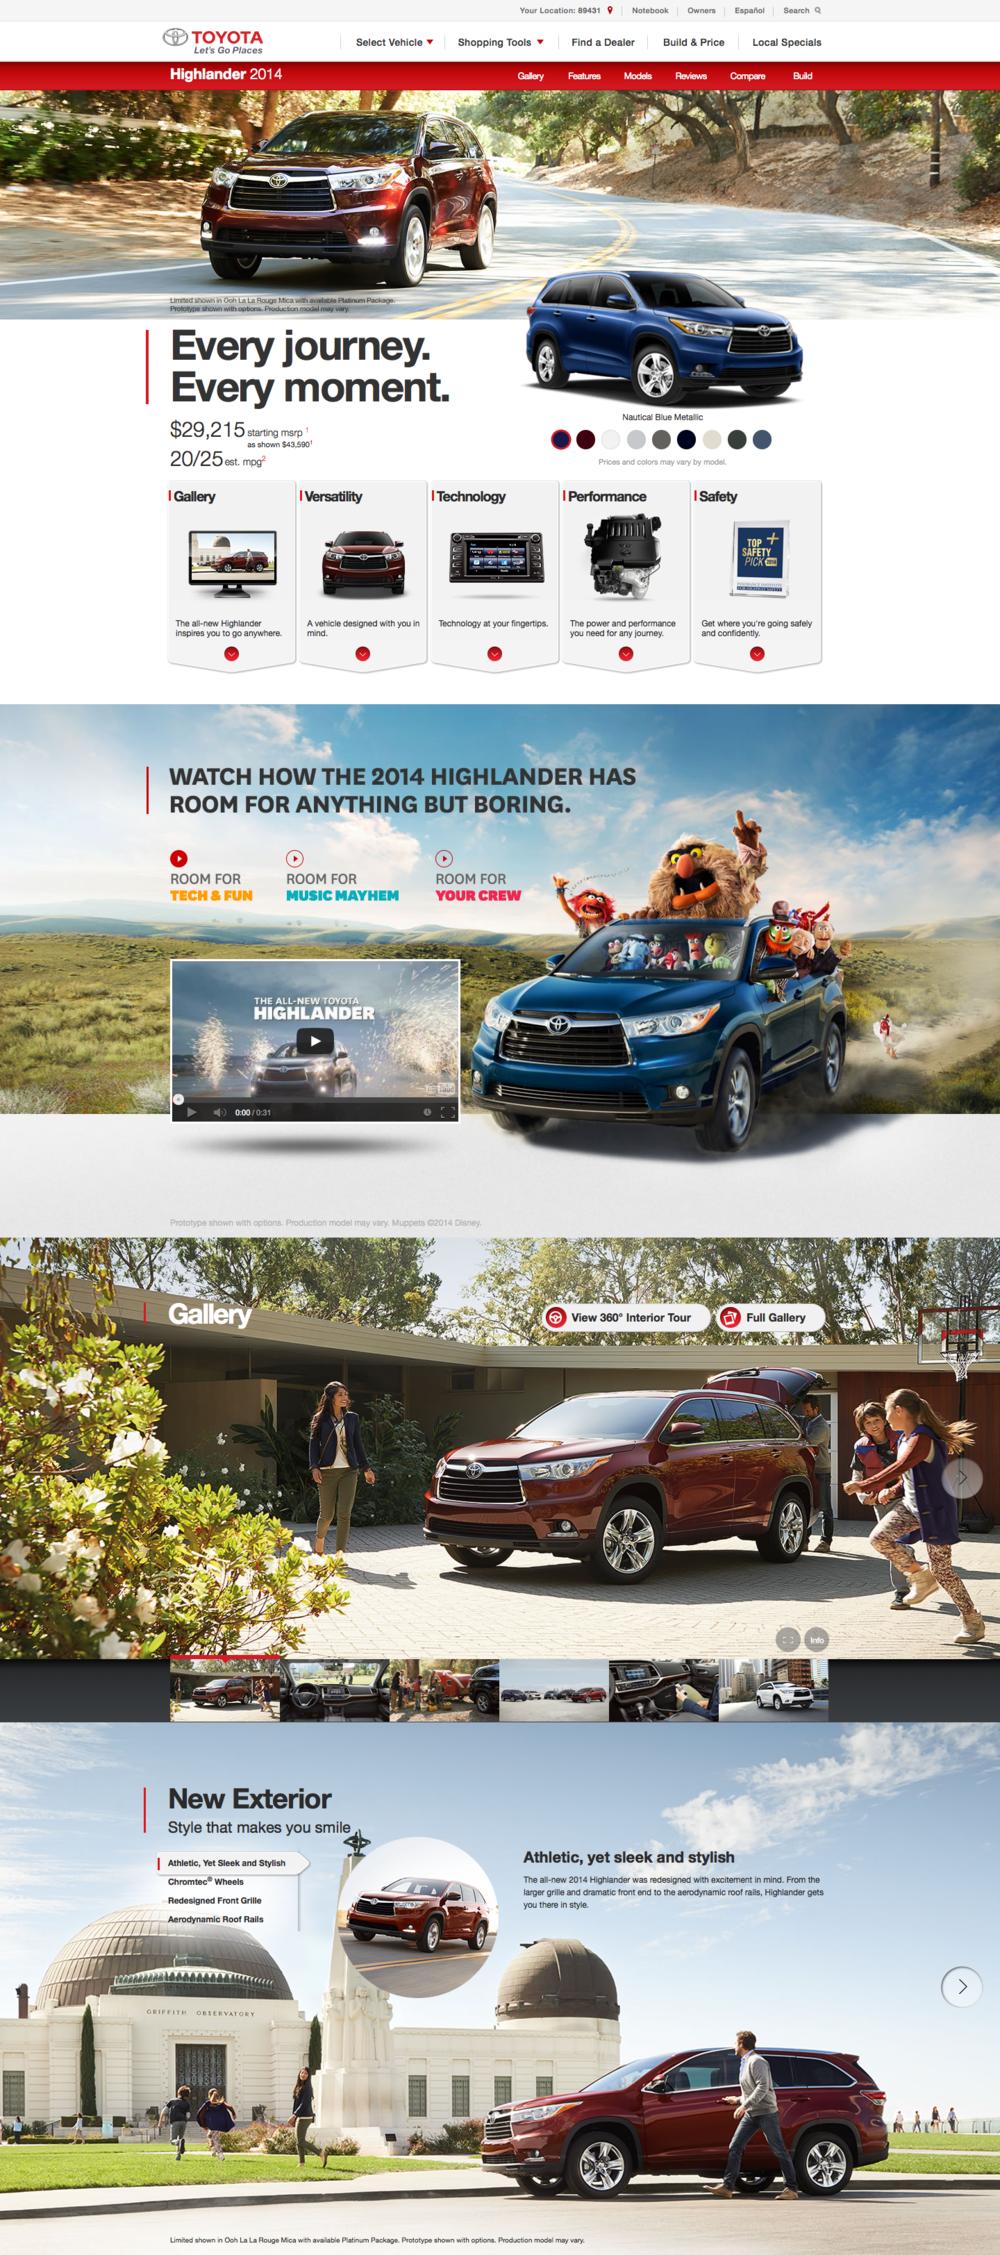 Toyota_Highlander_2014_Hybrid_&_Mid-Size_SUVs_-_2014-05-06_10.02.37.png